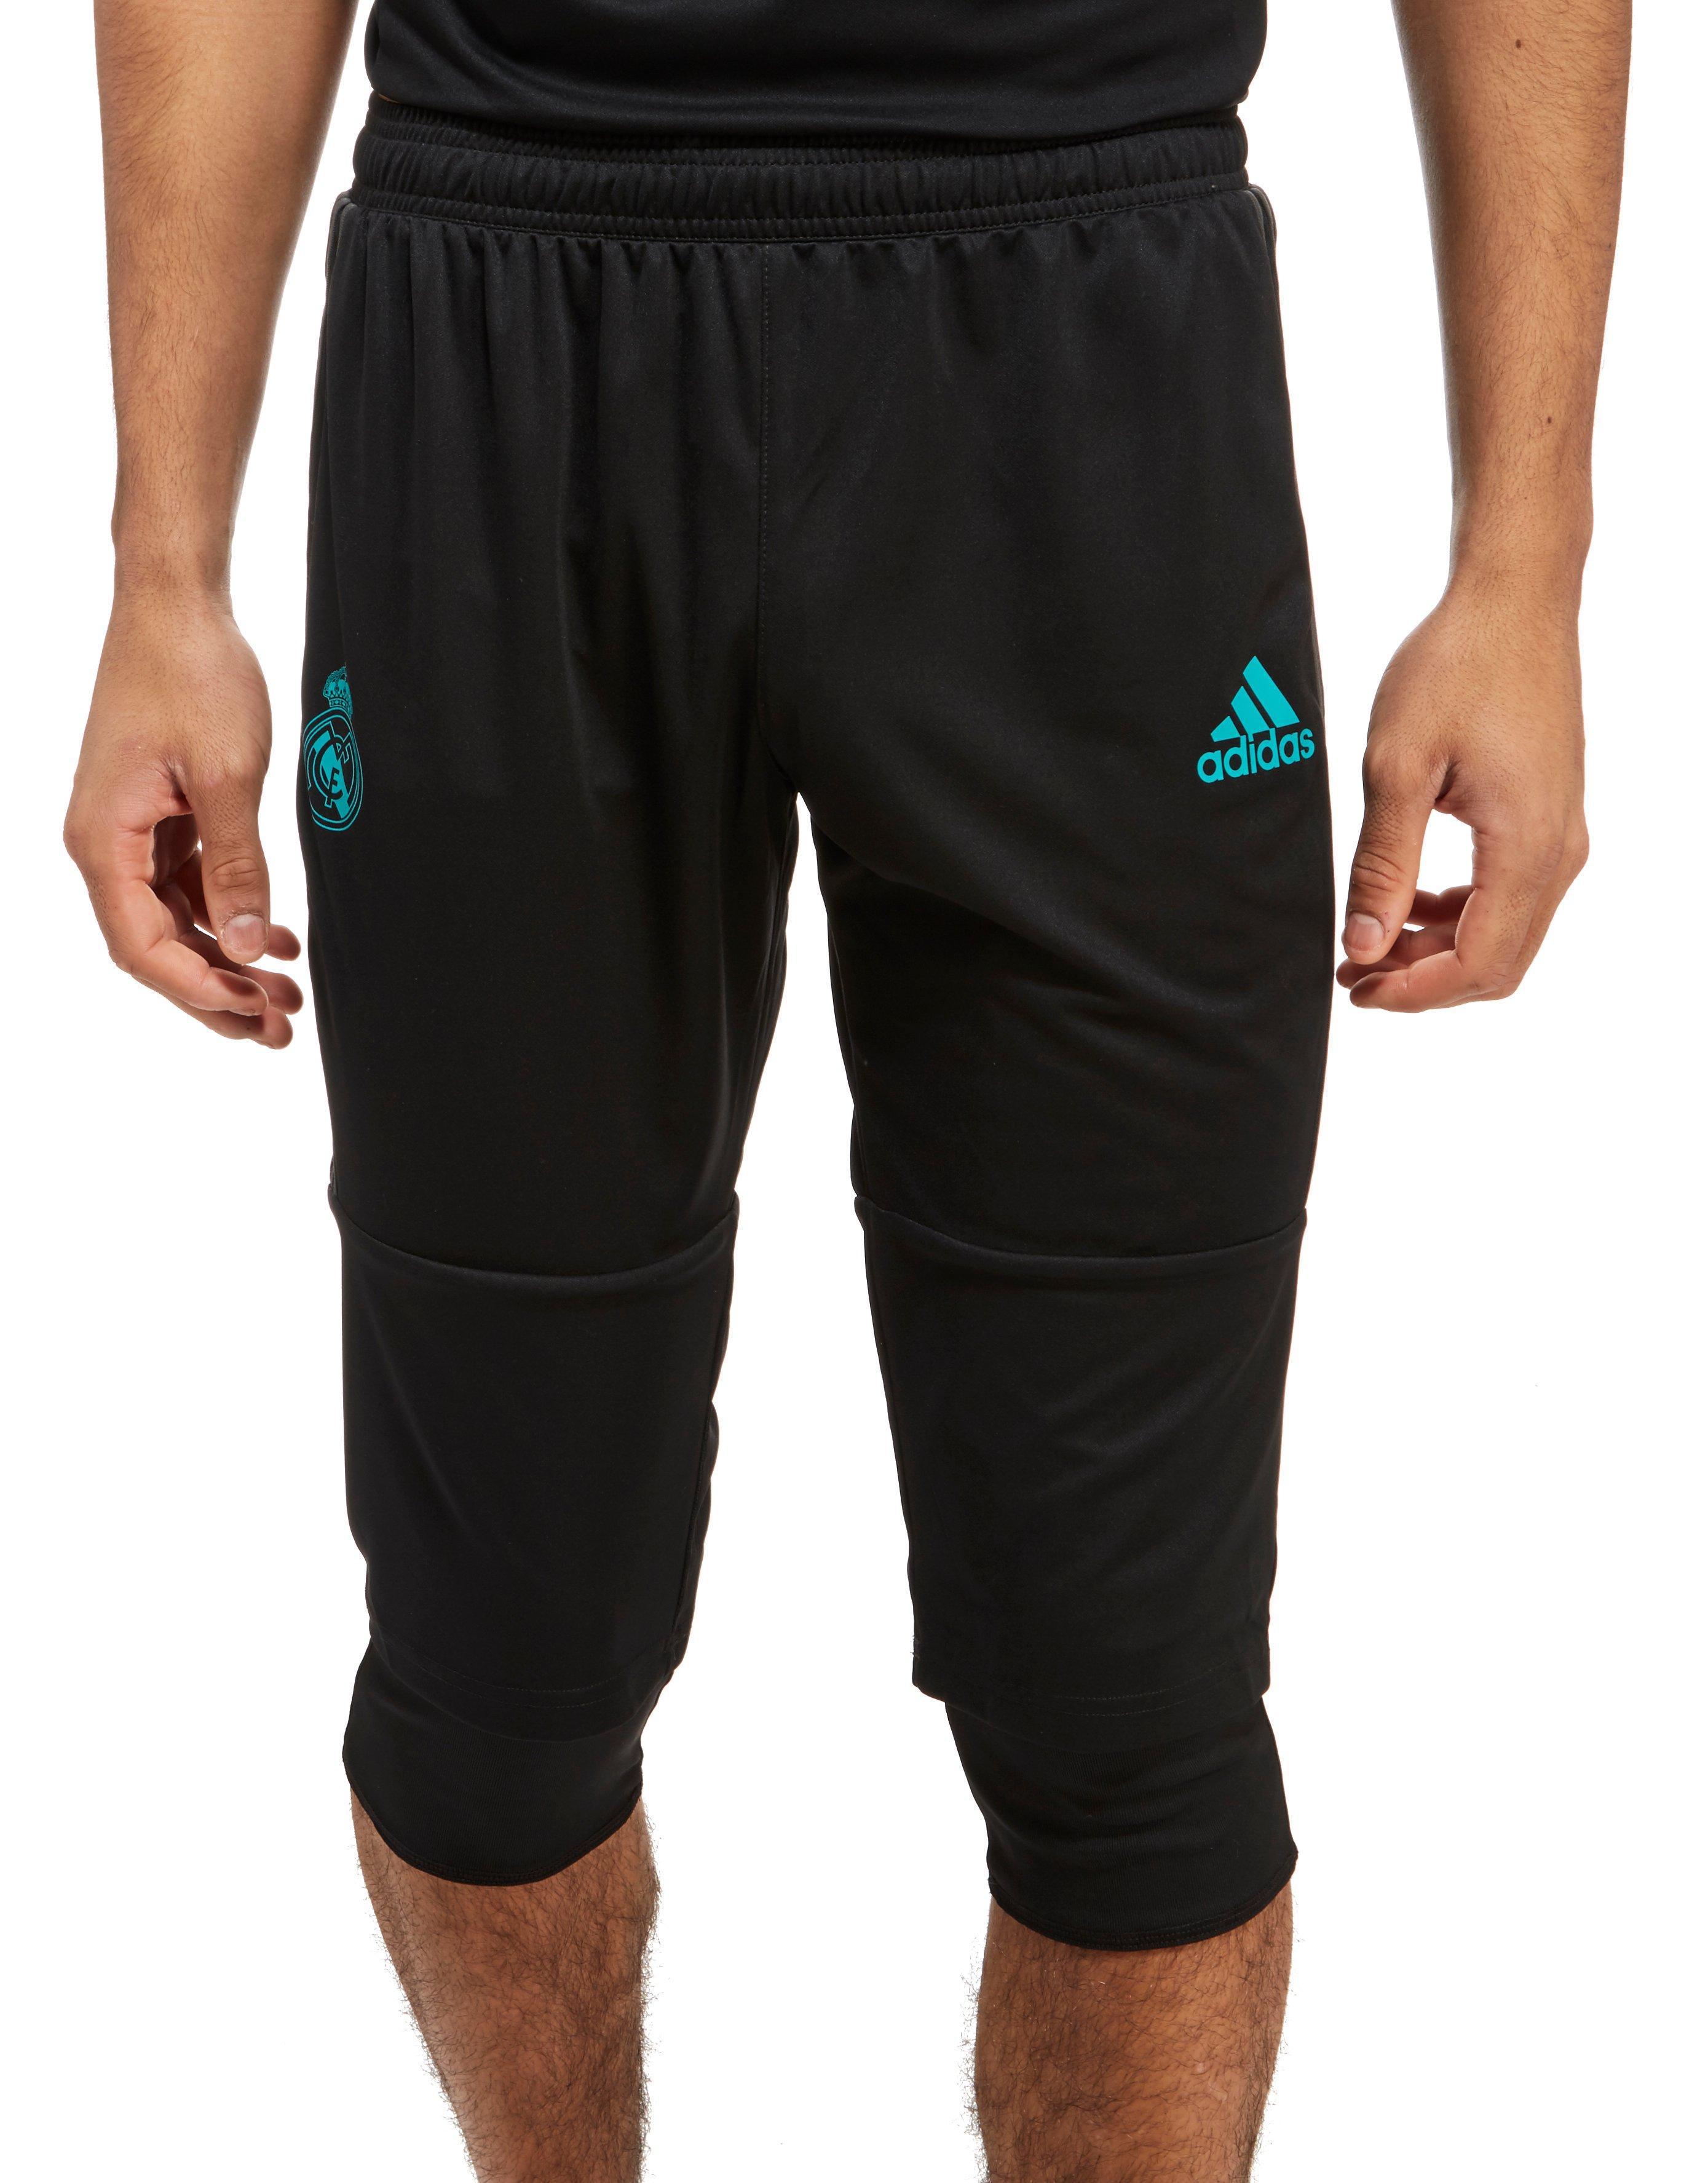 adidas 3 4 training pants